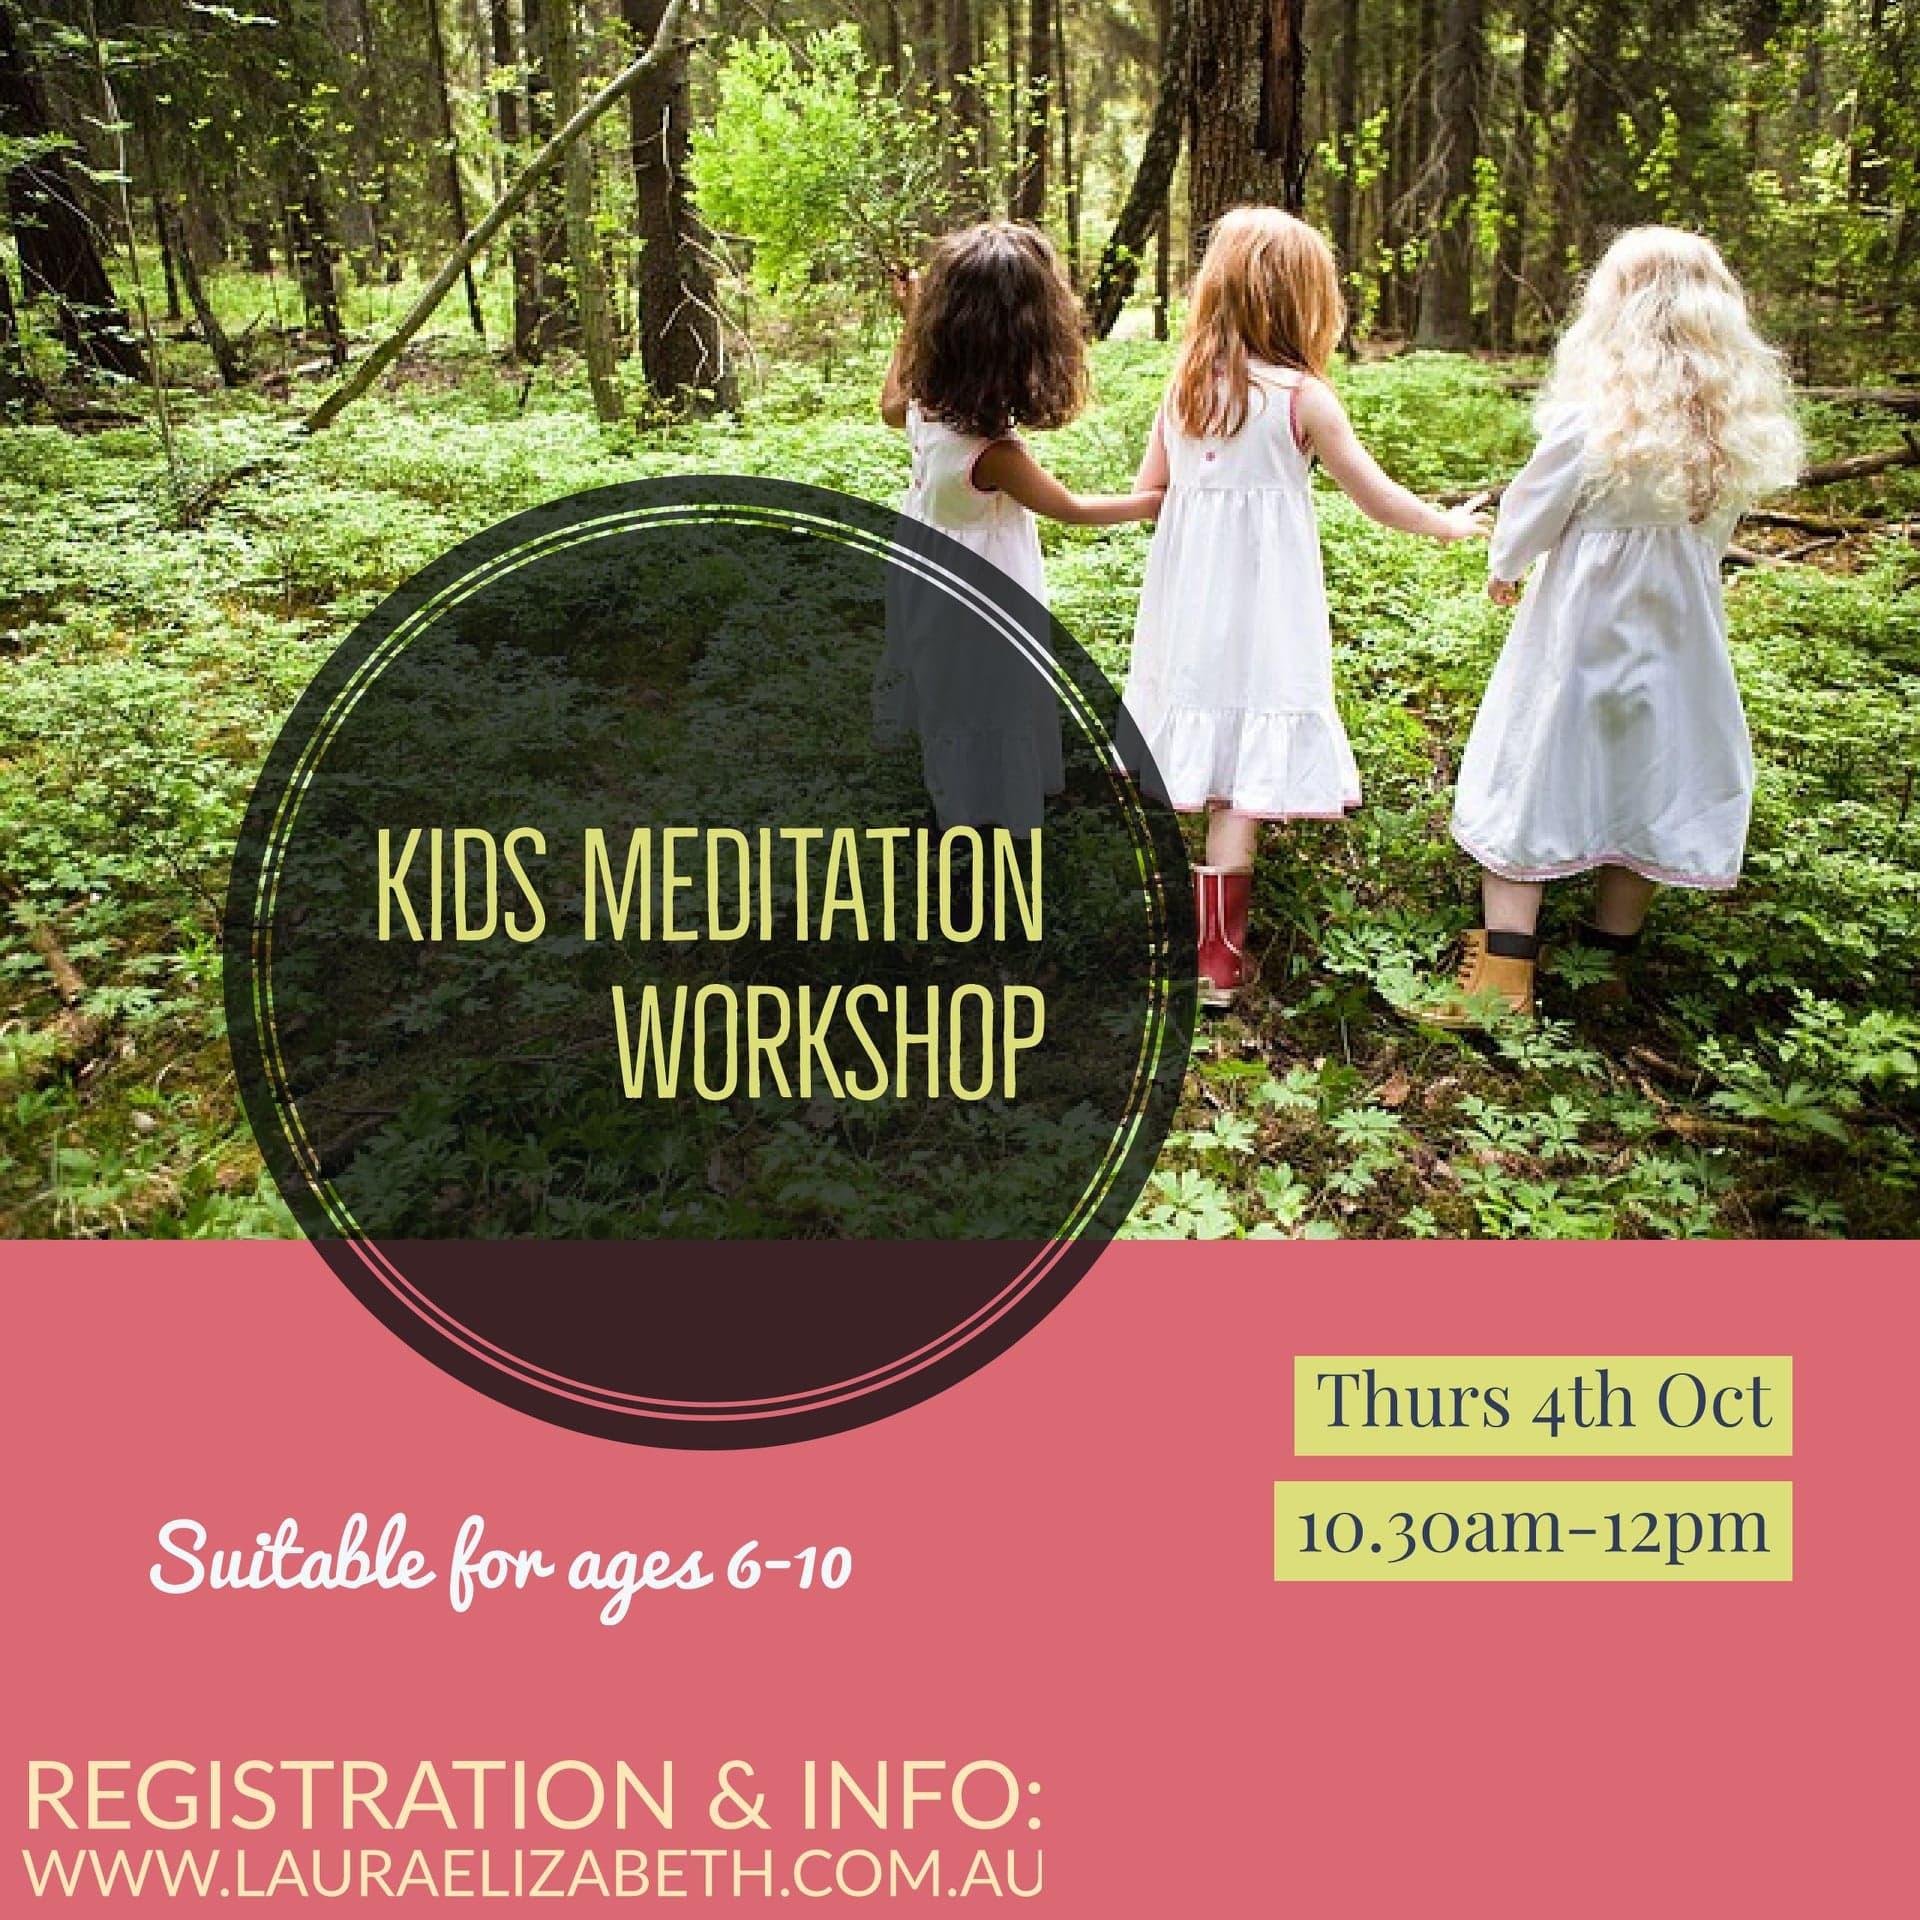 KidsMeditationWorkshop2.jpg